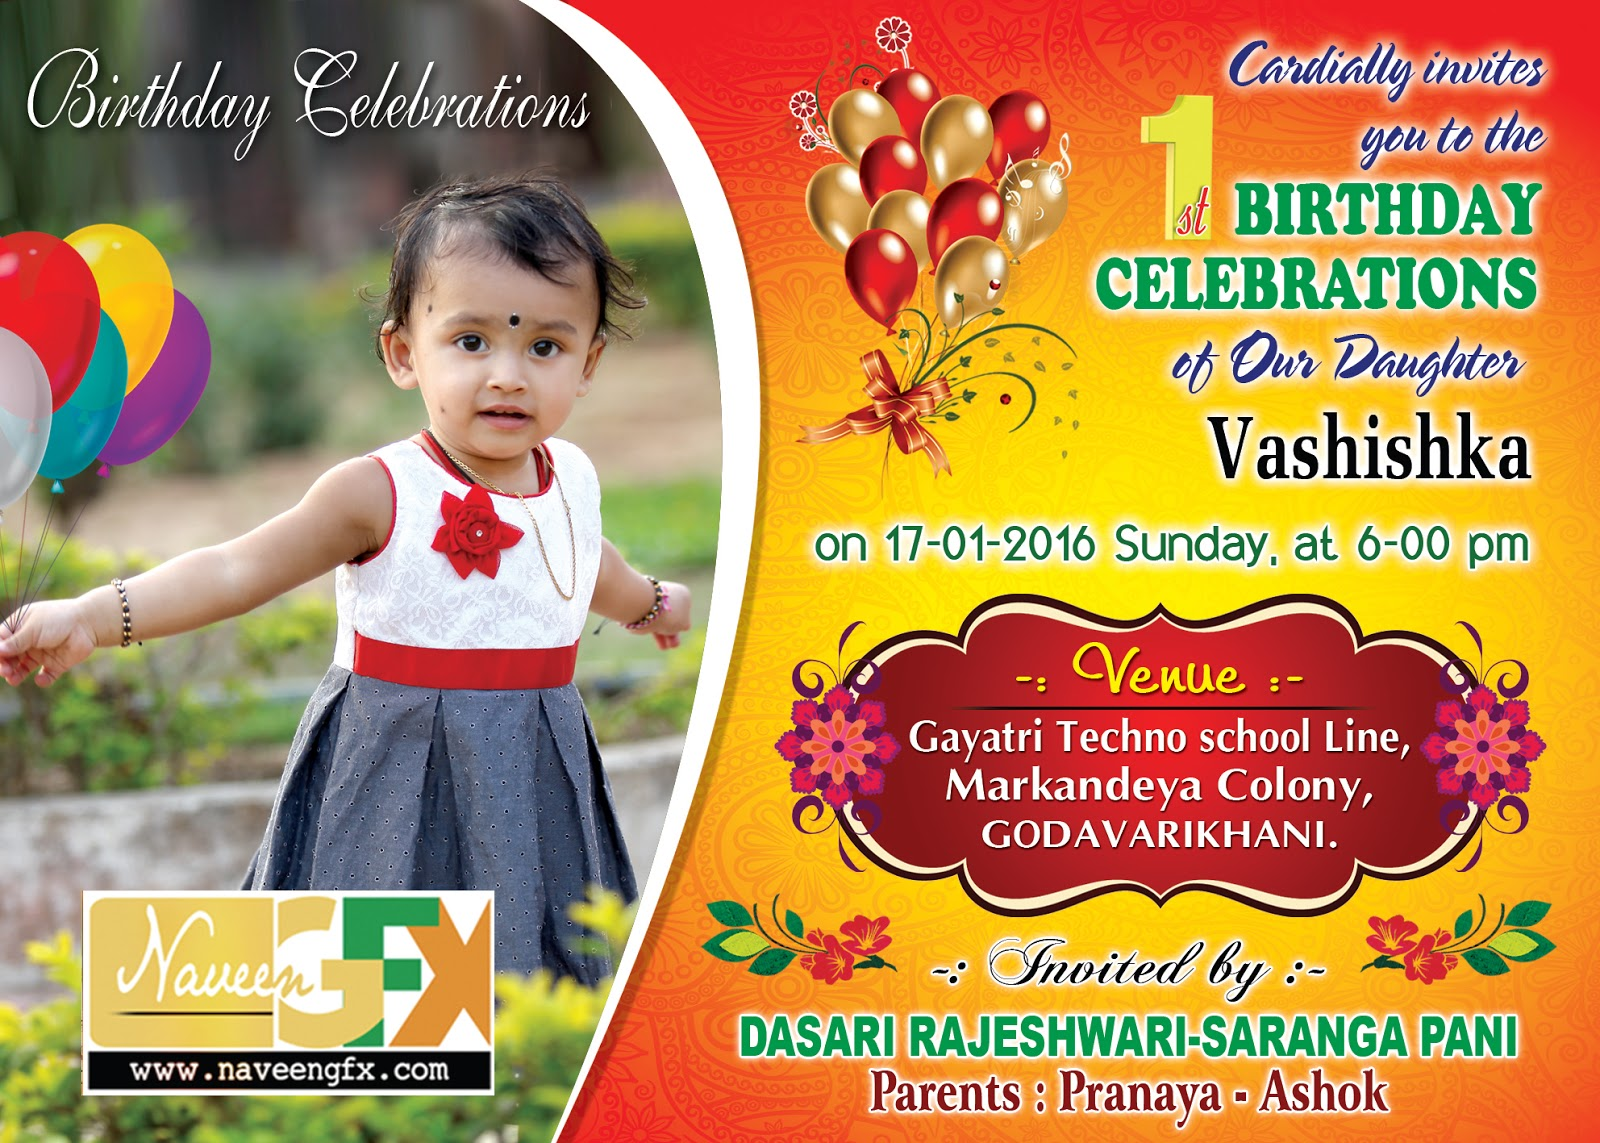 Sample Birthday Invitations Cards Psd Templates Free Downloads Naveengfx